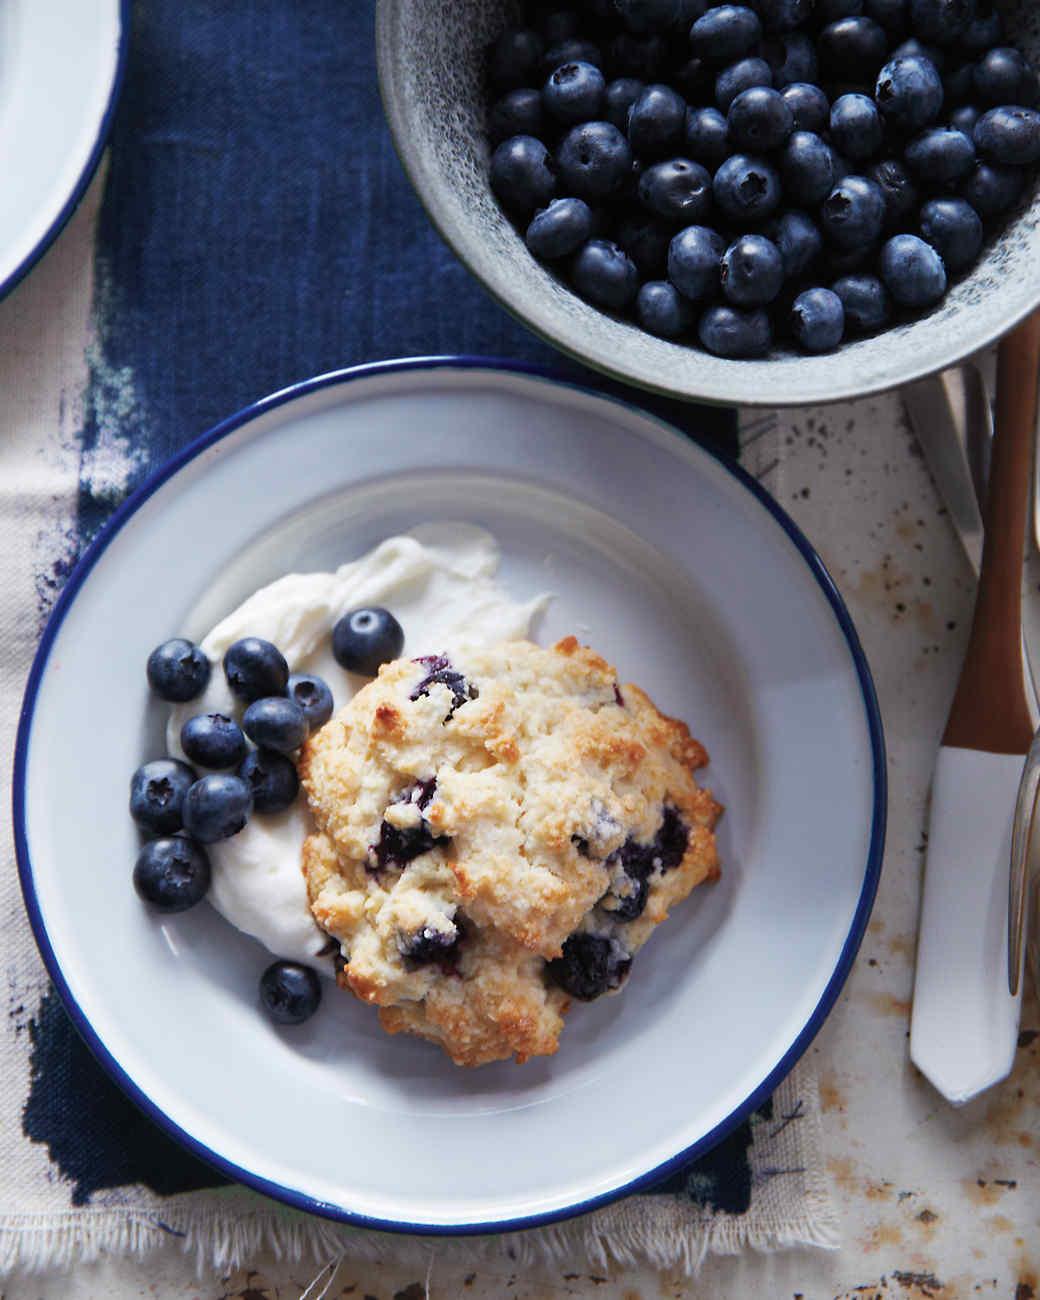 blueberry-shortcakes-a130315-03-4487-md109207.jpg